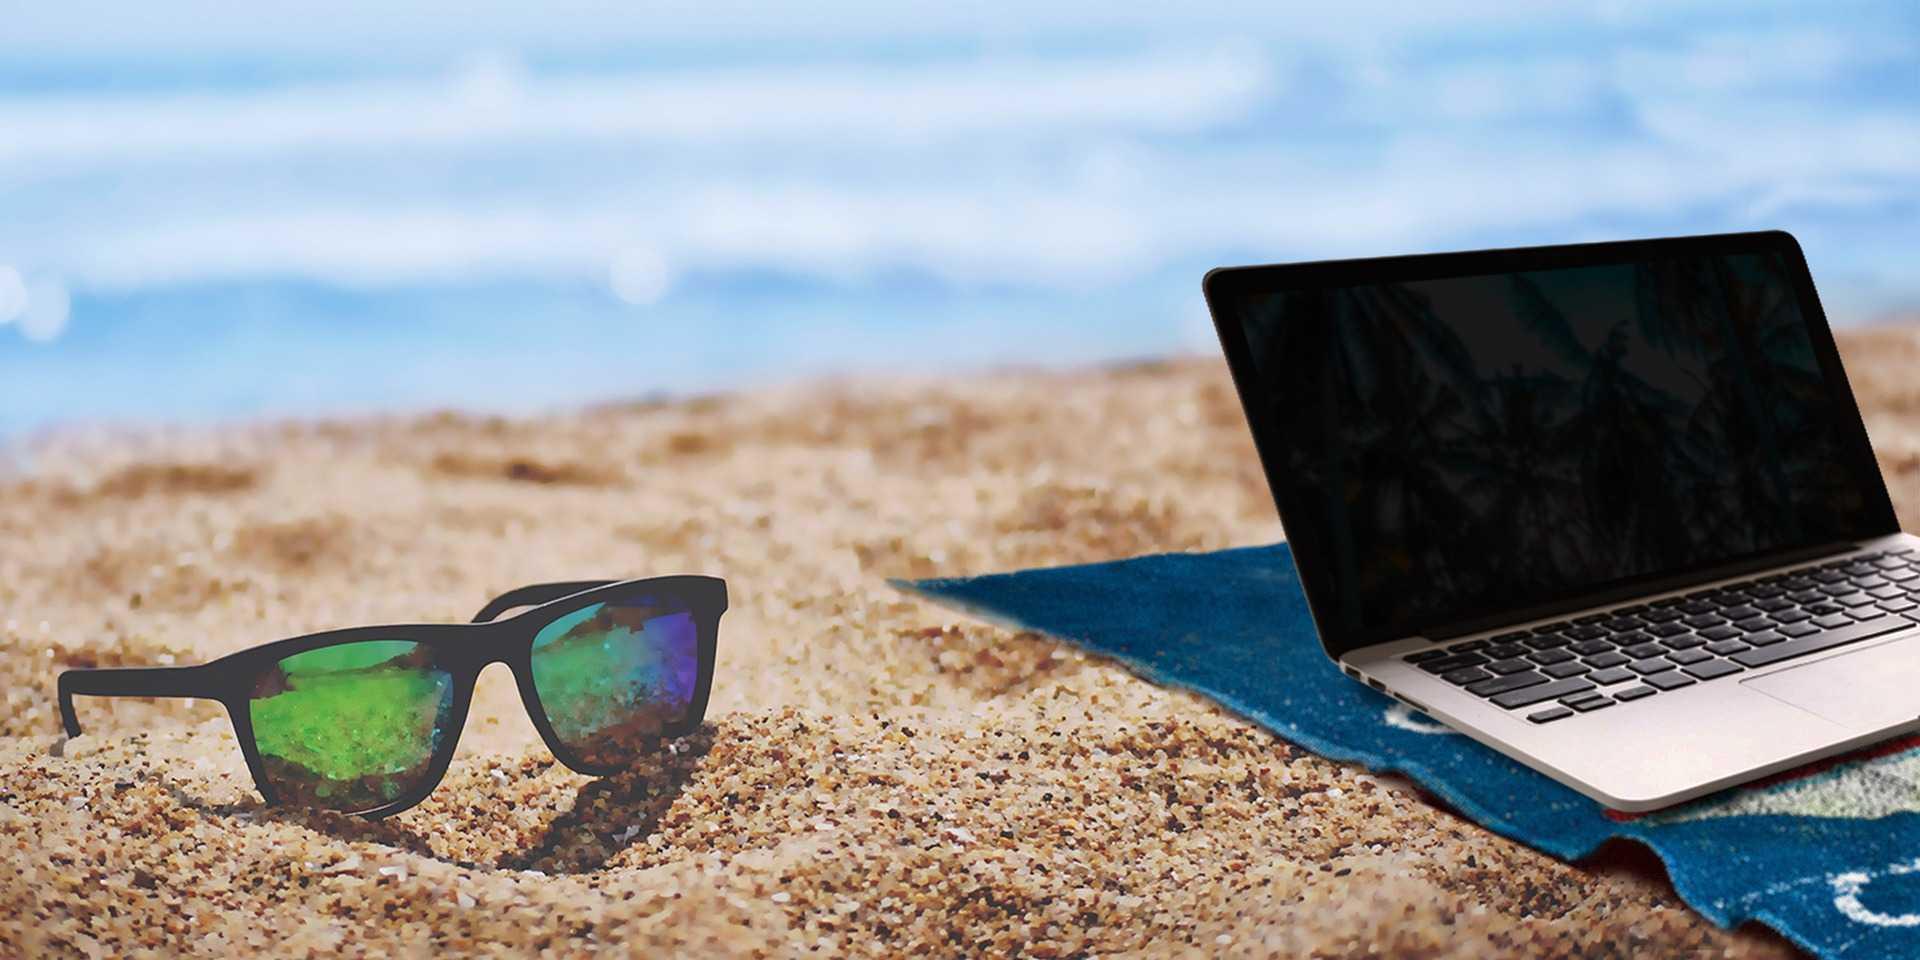 Freelance Writing Jobs Online | Sign Up & Start Earning - Topcontent